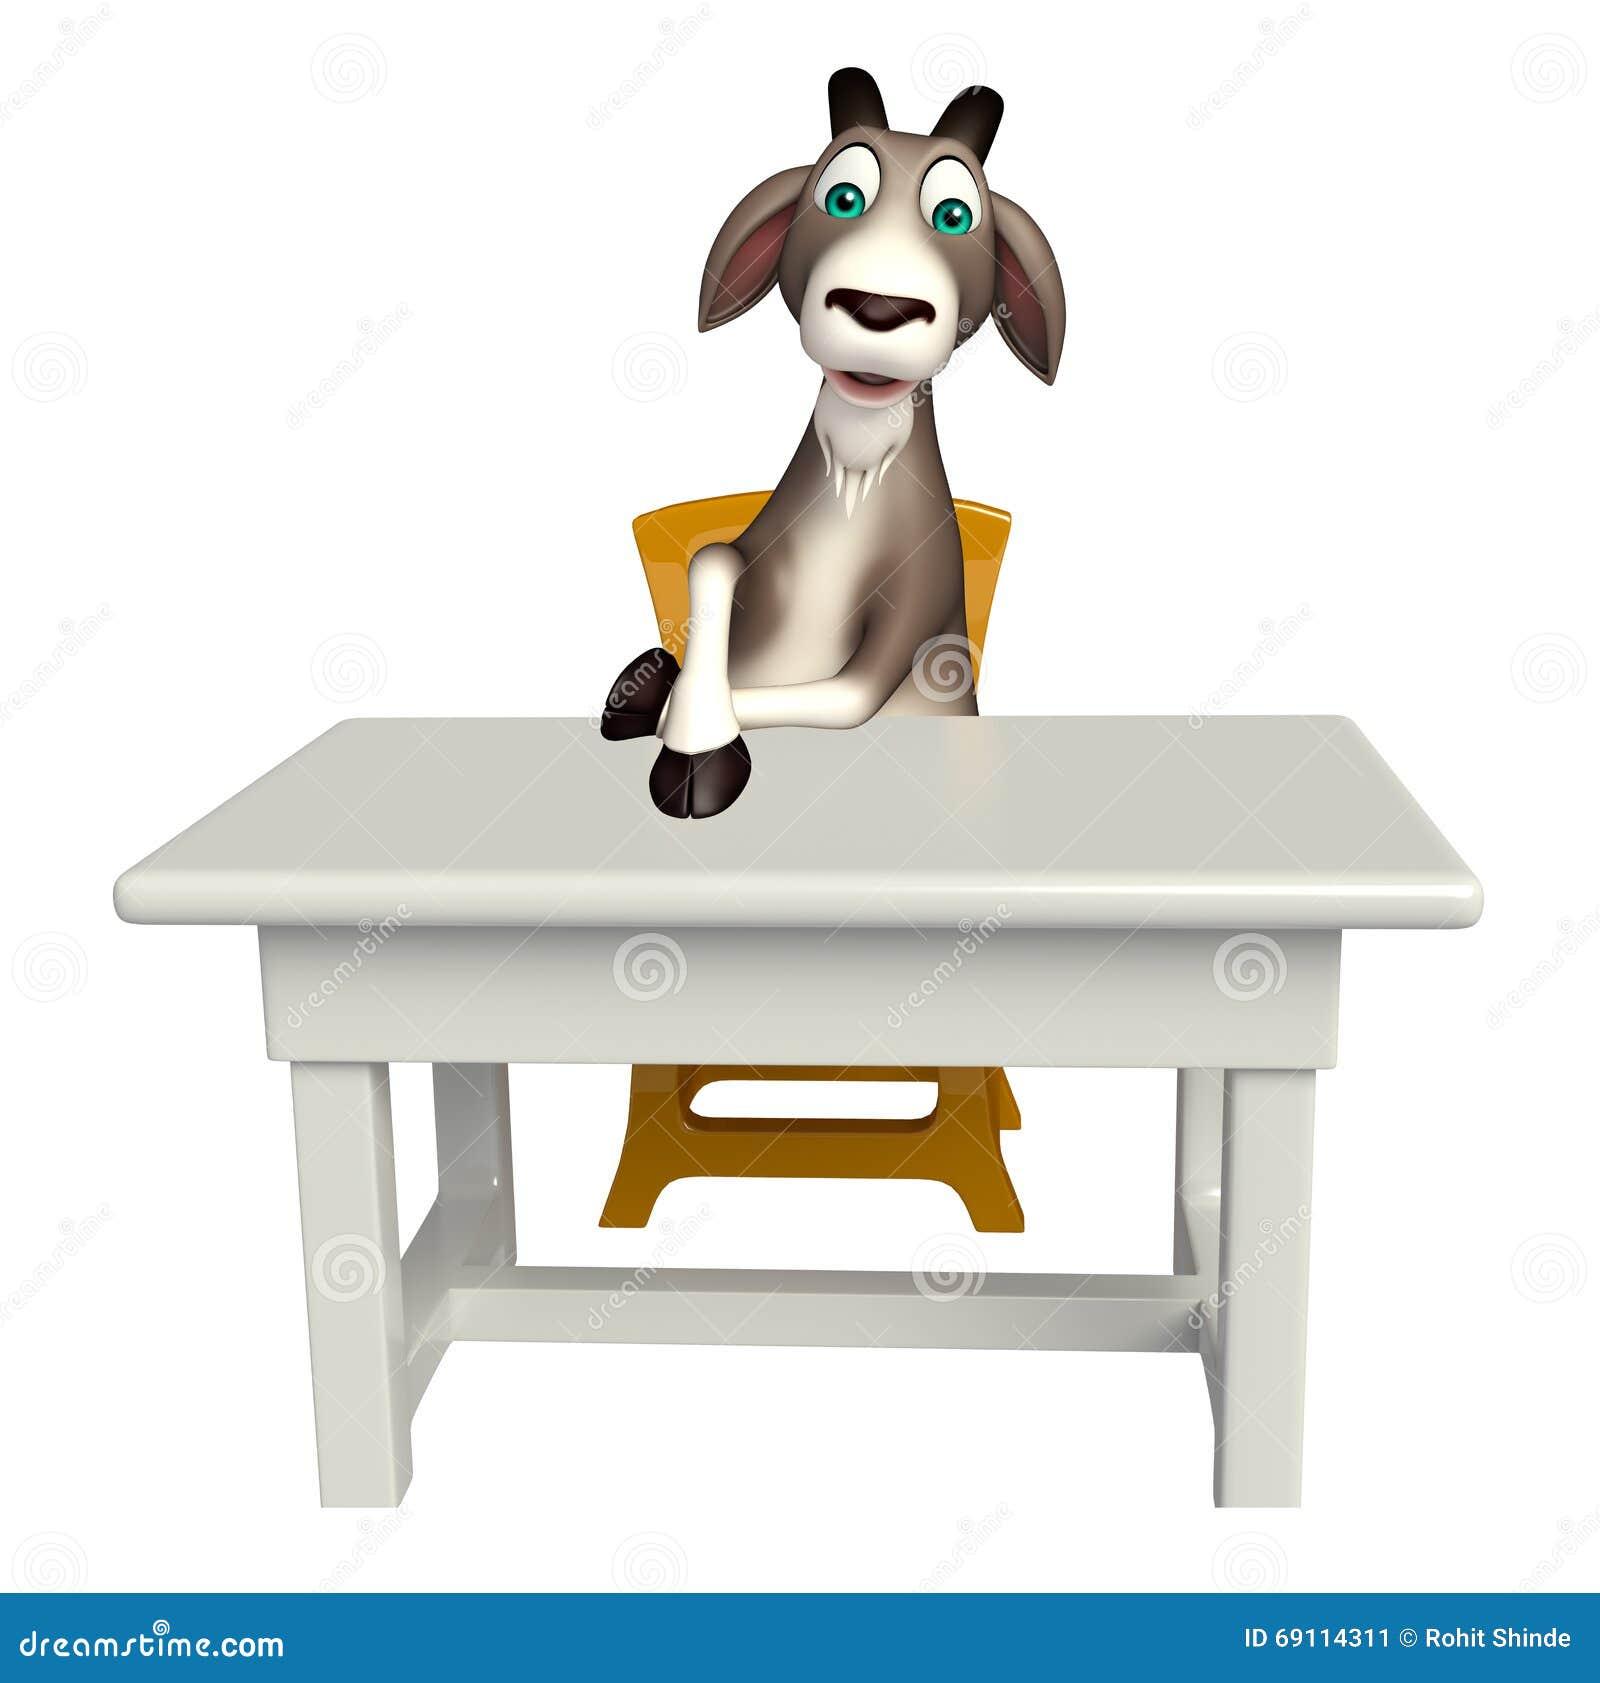 Swell Goat Cartoon Character With Table And Chair Stock Creativecarmelina Interior Chair Design Creativecarmelinacom